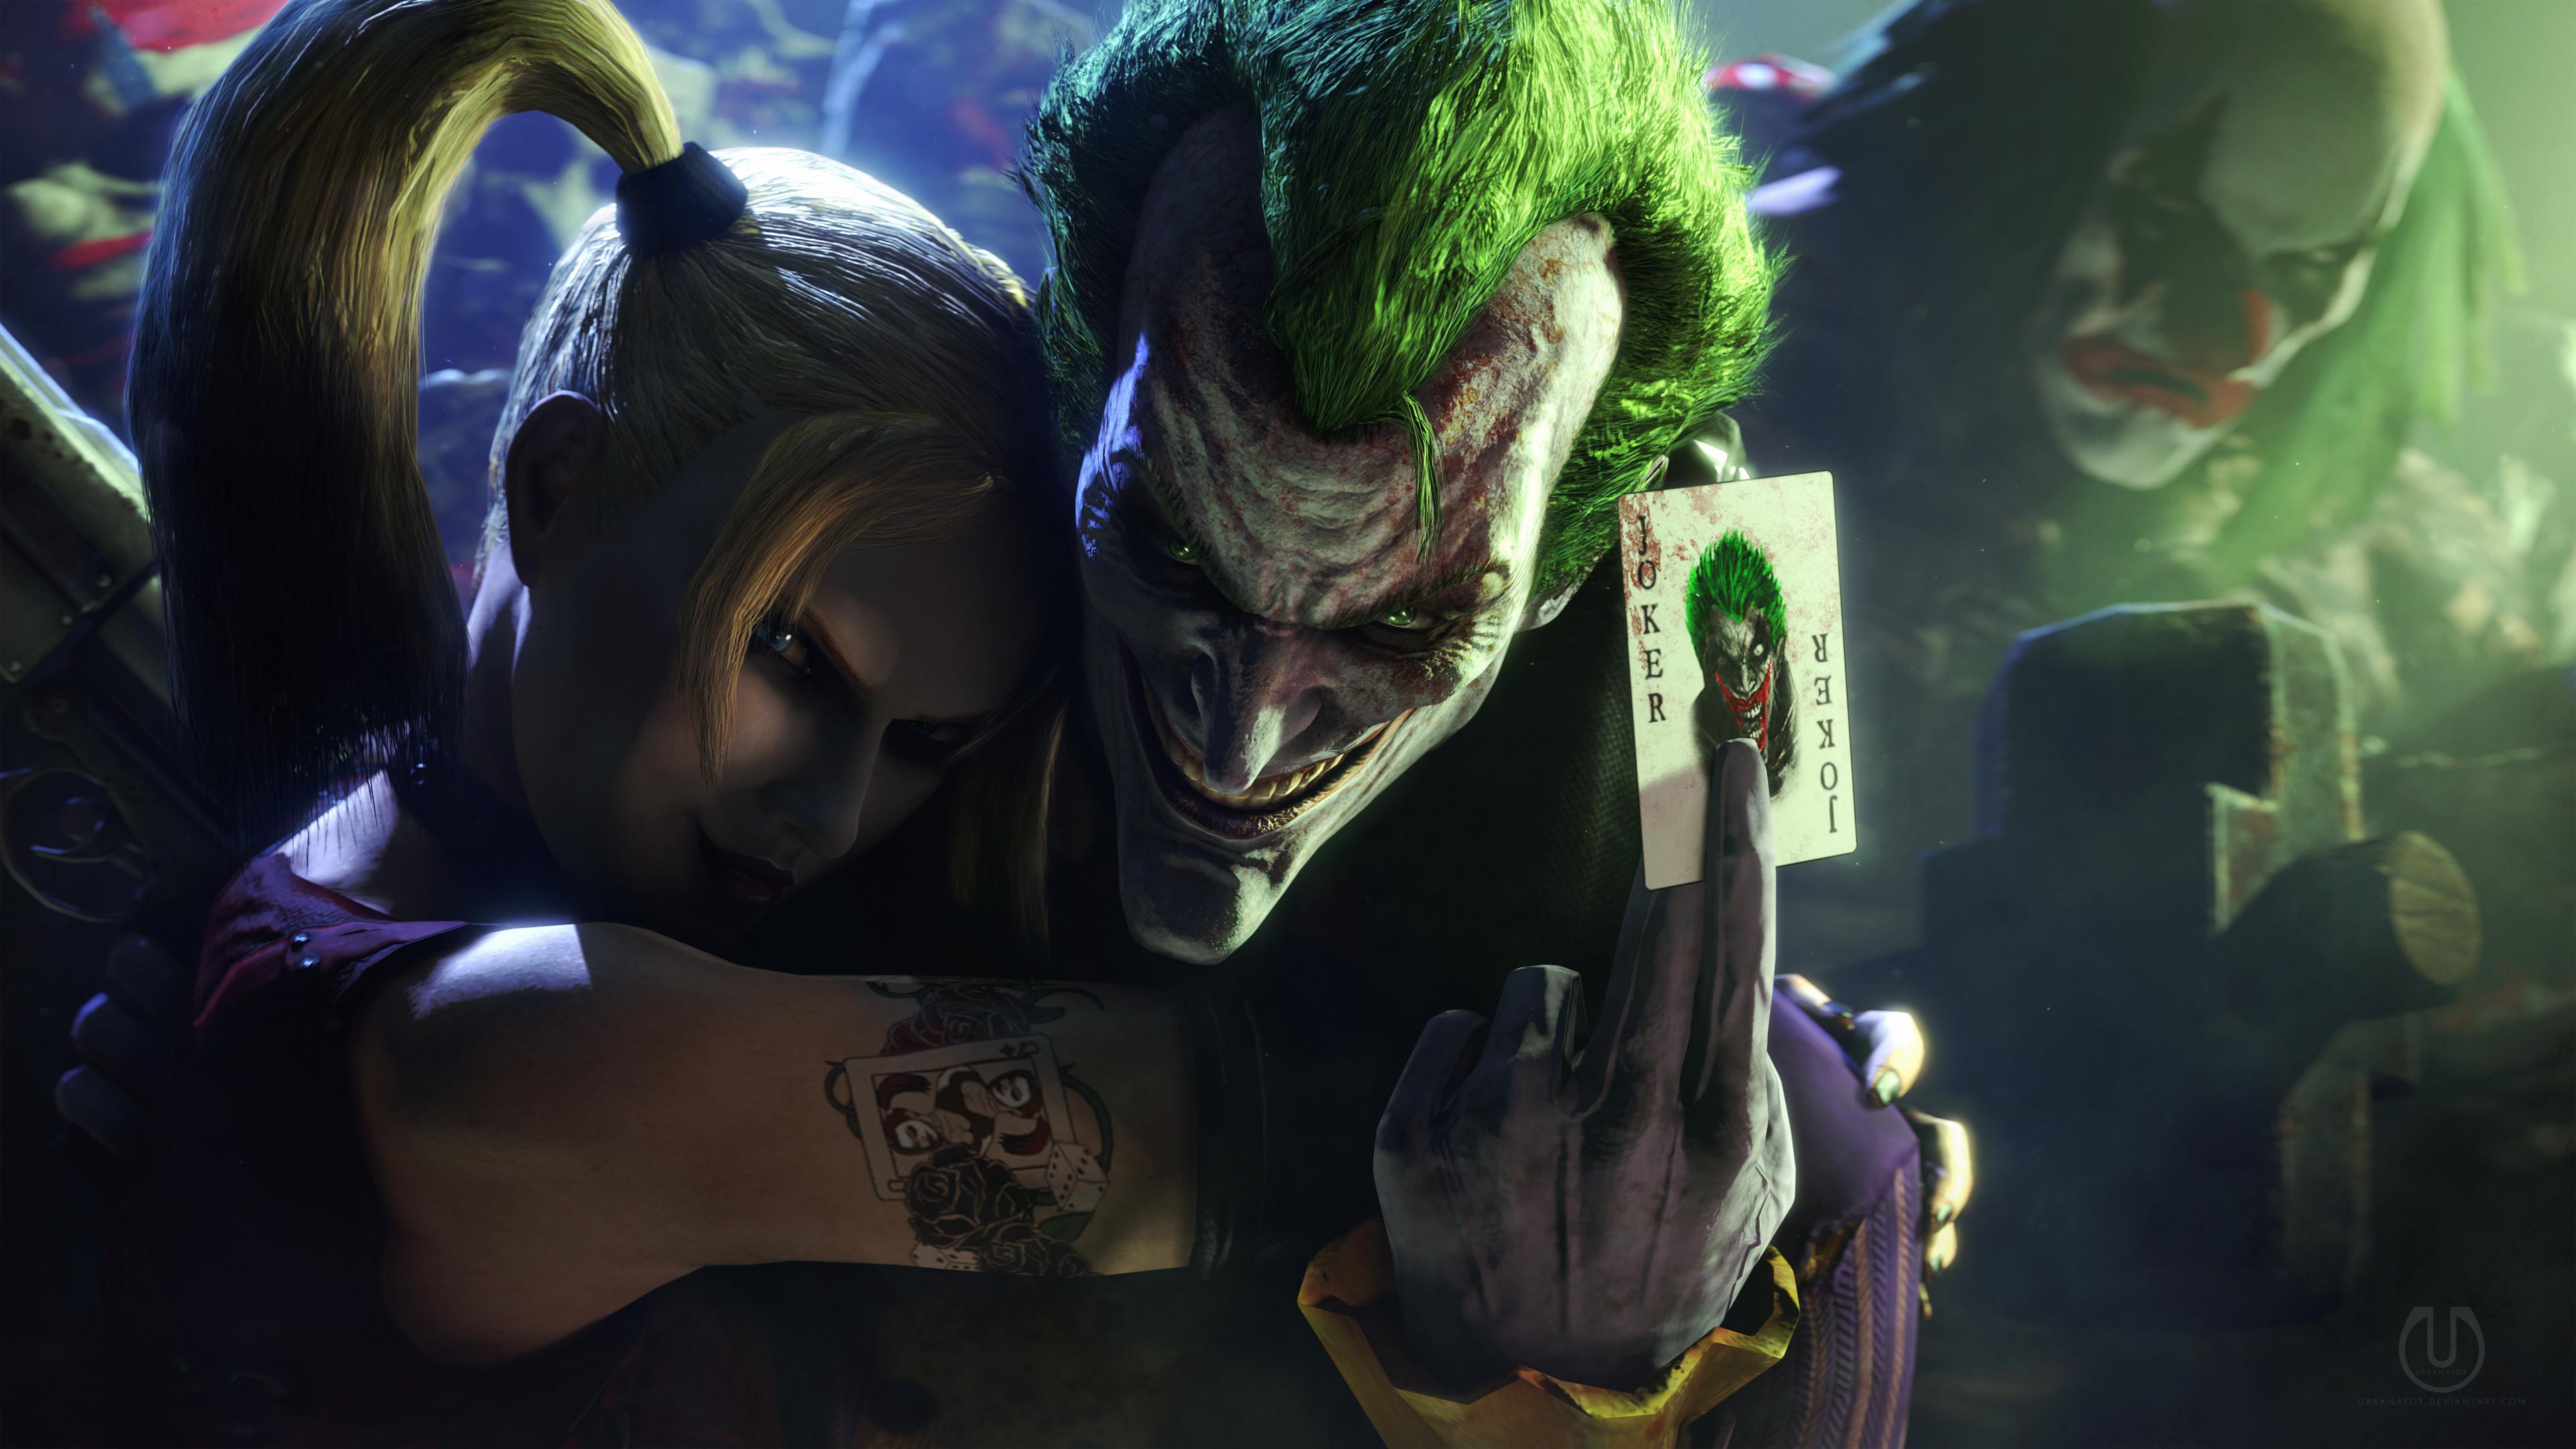 Joker and Harley Quinn | Batman